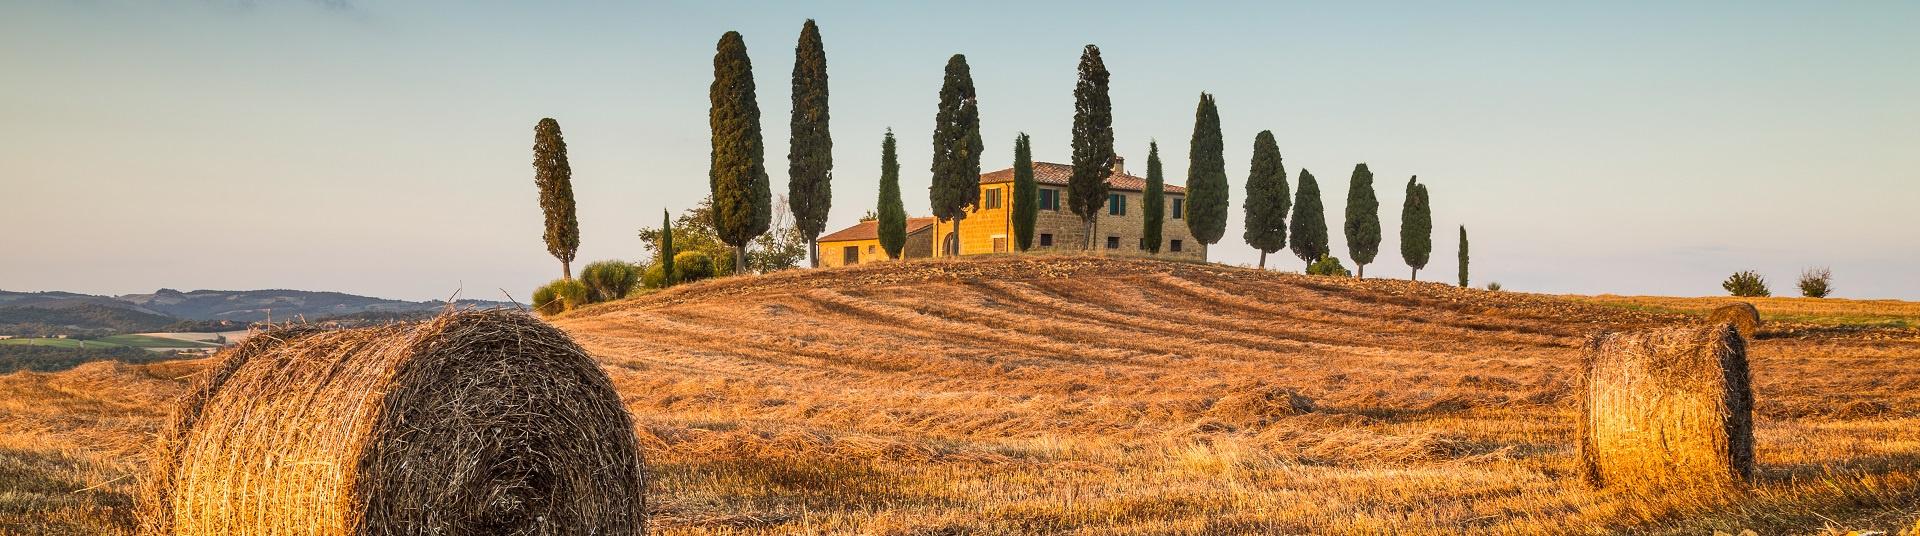 Week-end pas cher Toscane